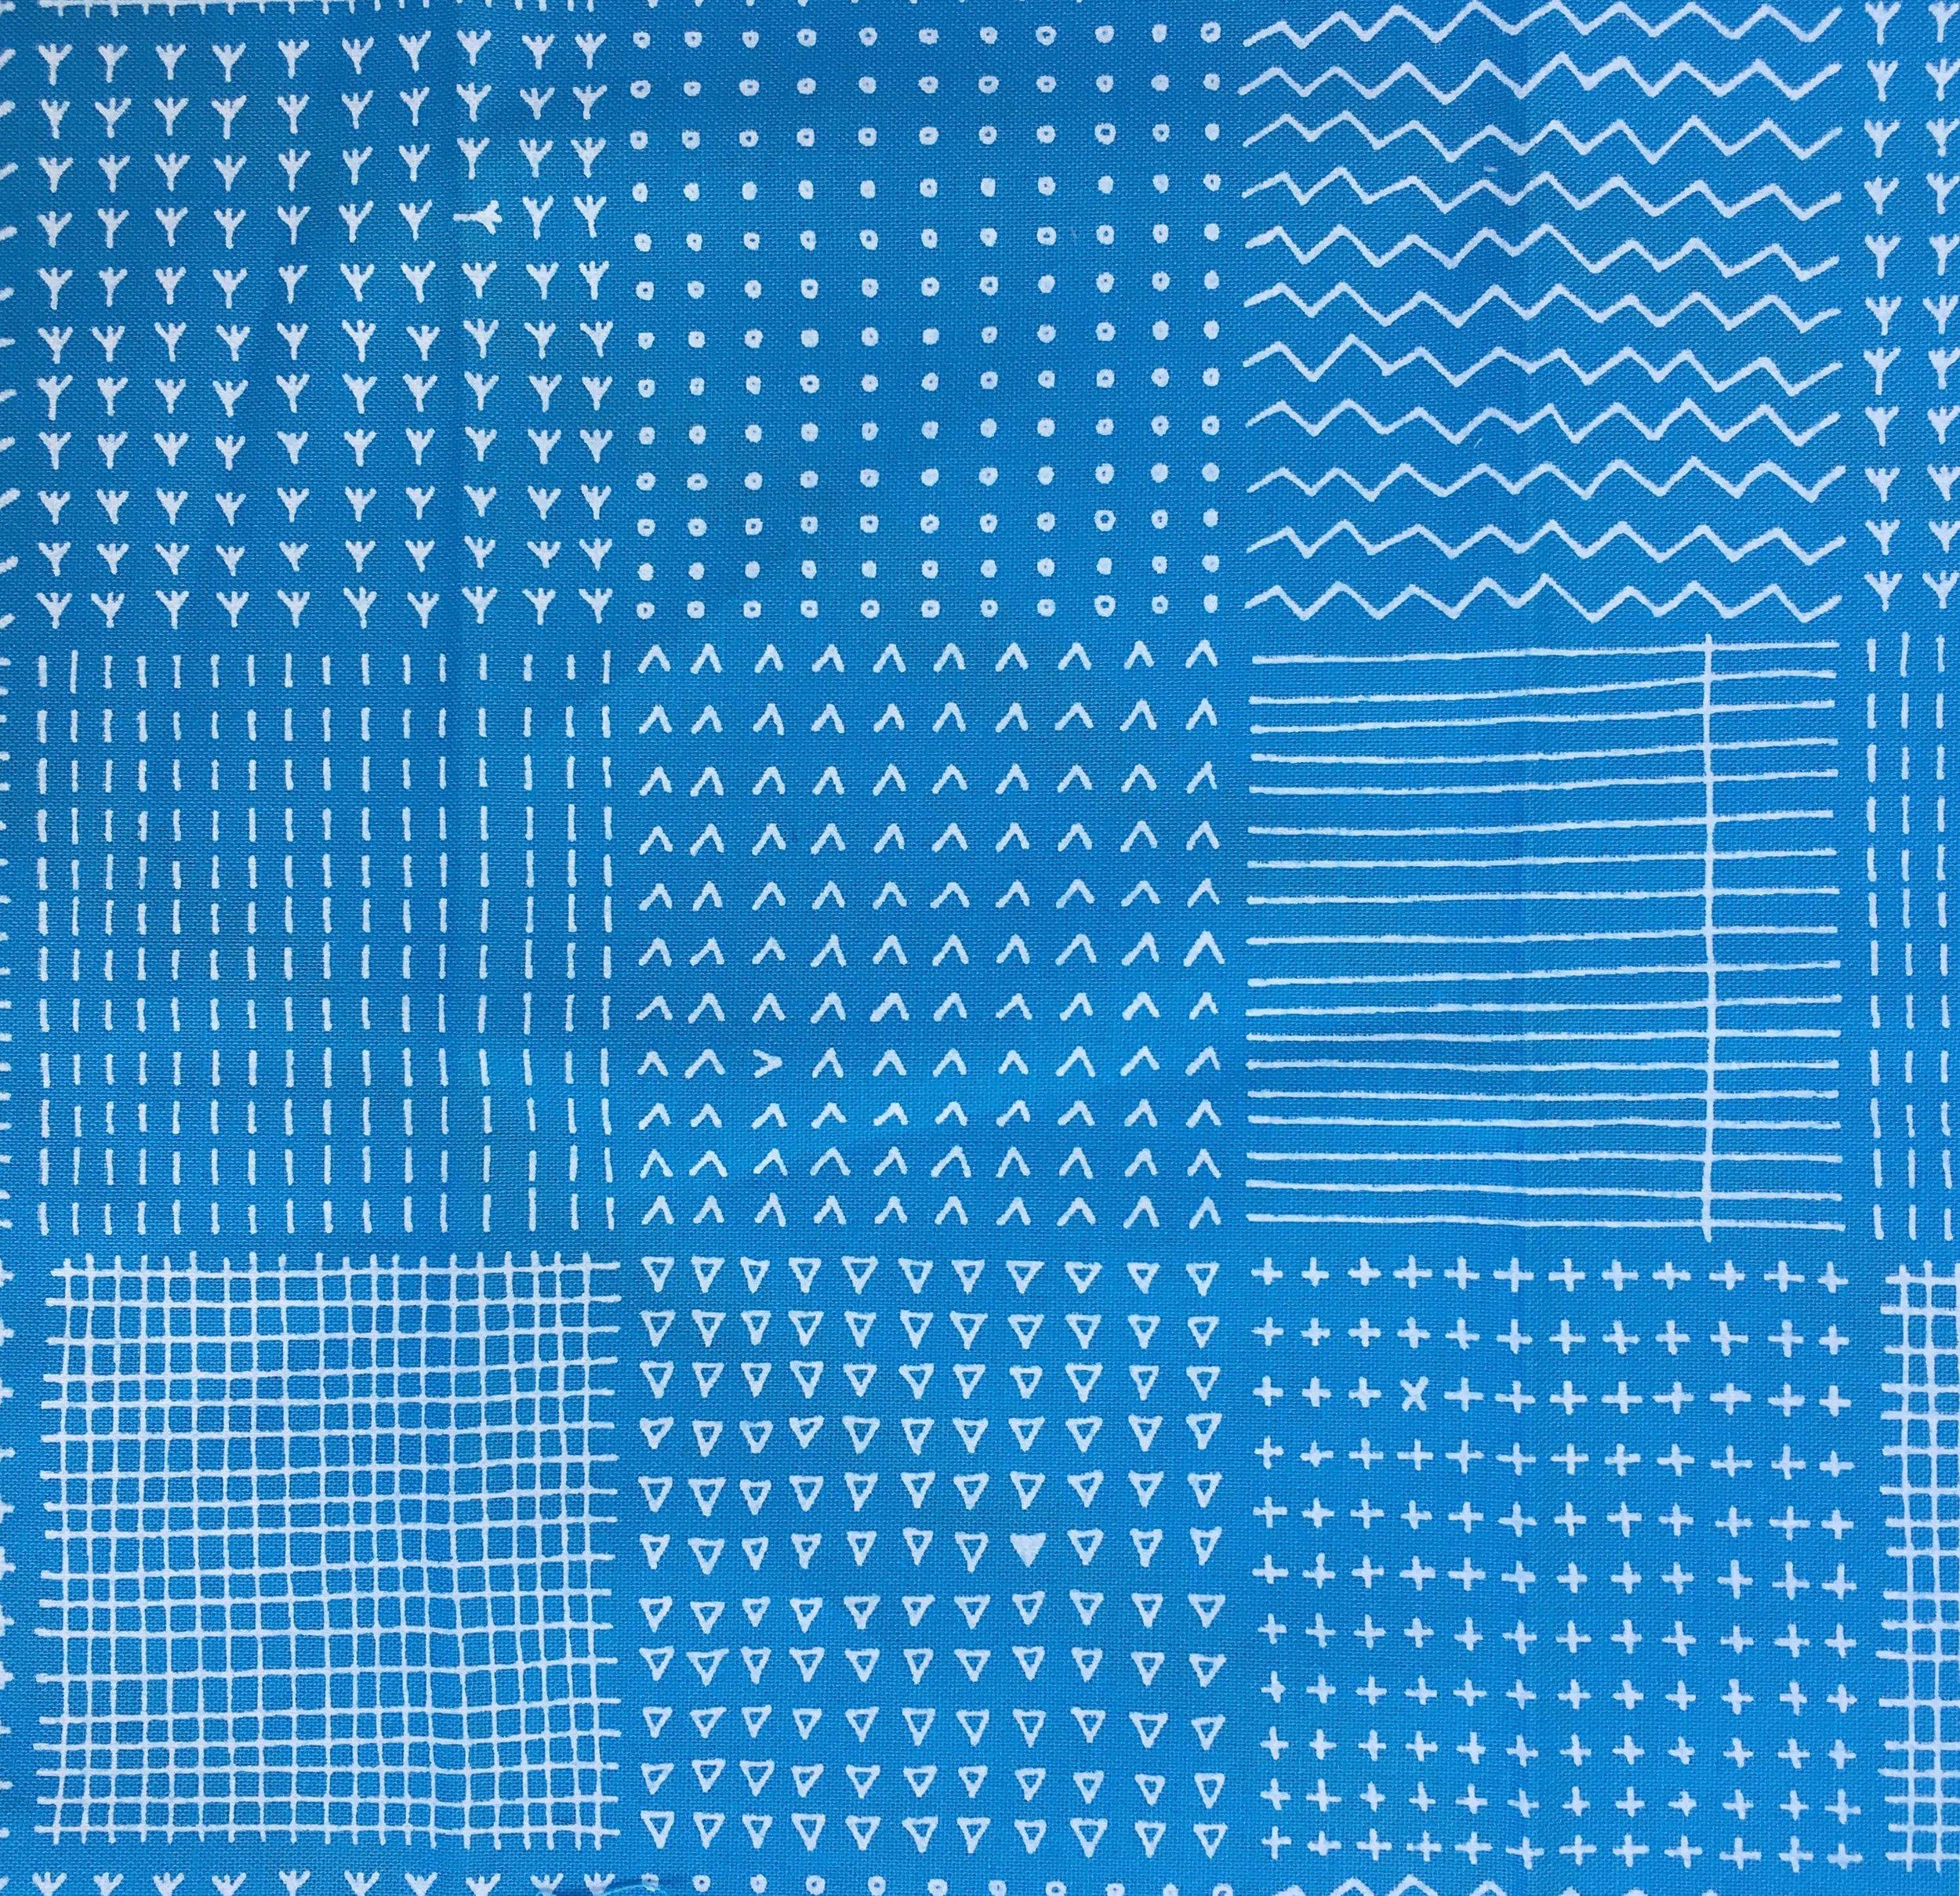 Quilt Salt Water Crossing Blueberry Park fabric.jpg